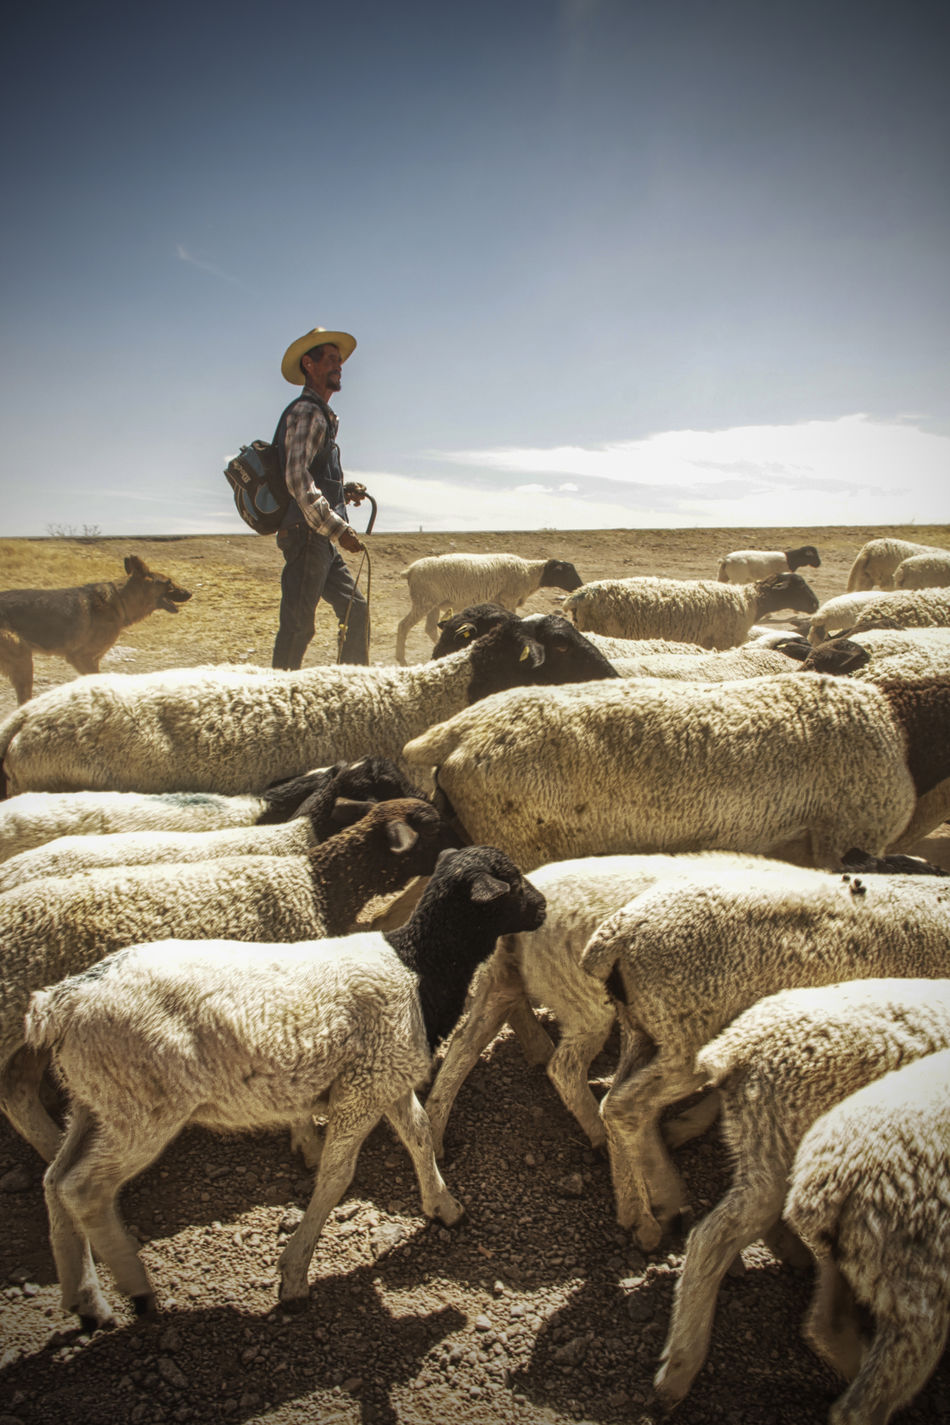 SHEPERD Agricultor Agriculture Campo Dog Pastoraleman Man Ovejas Ovejas Para Dormir Pastor Sheep Sheeps Shep Sheperd Shepherd